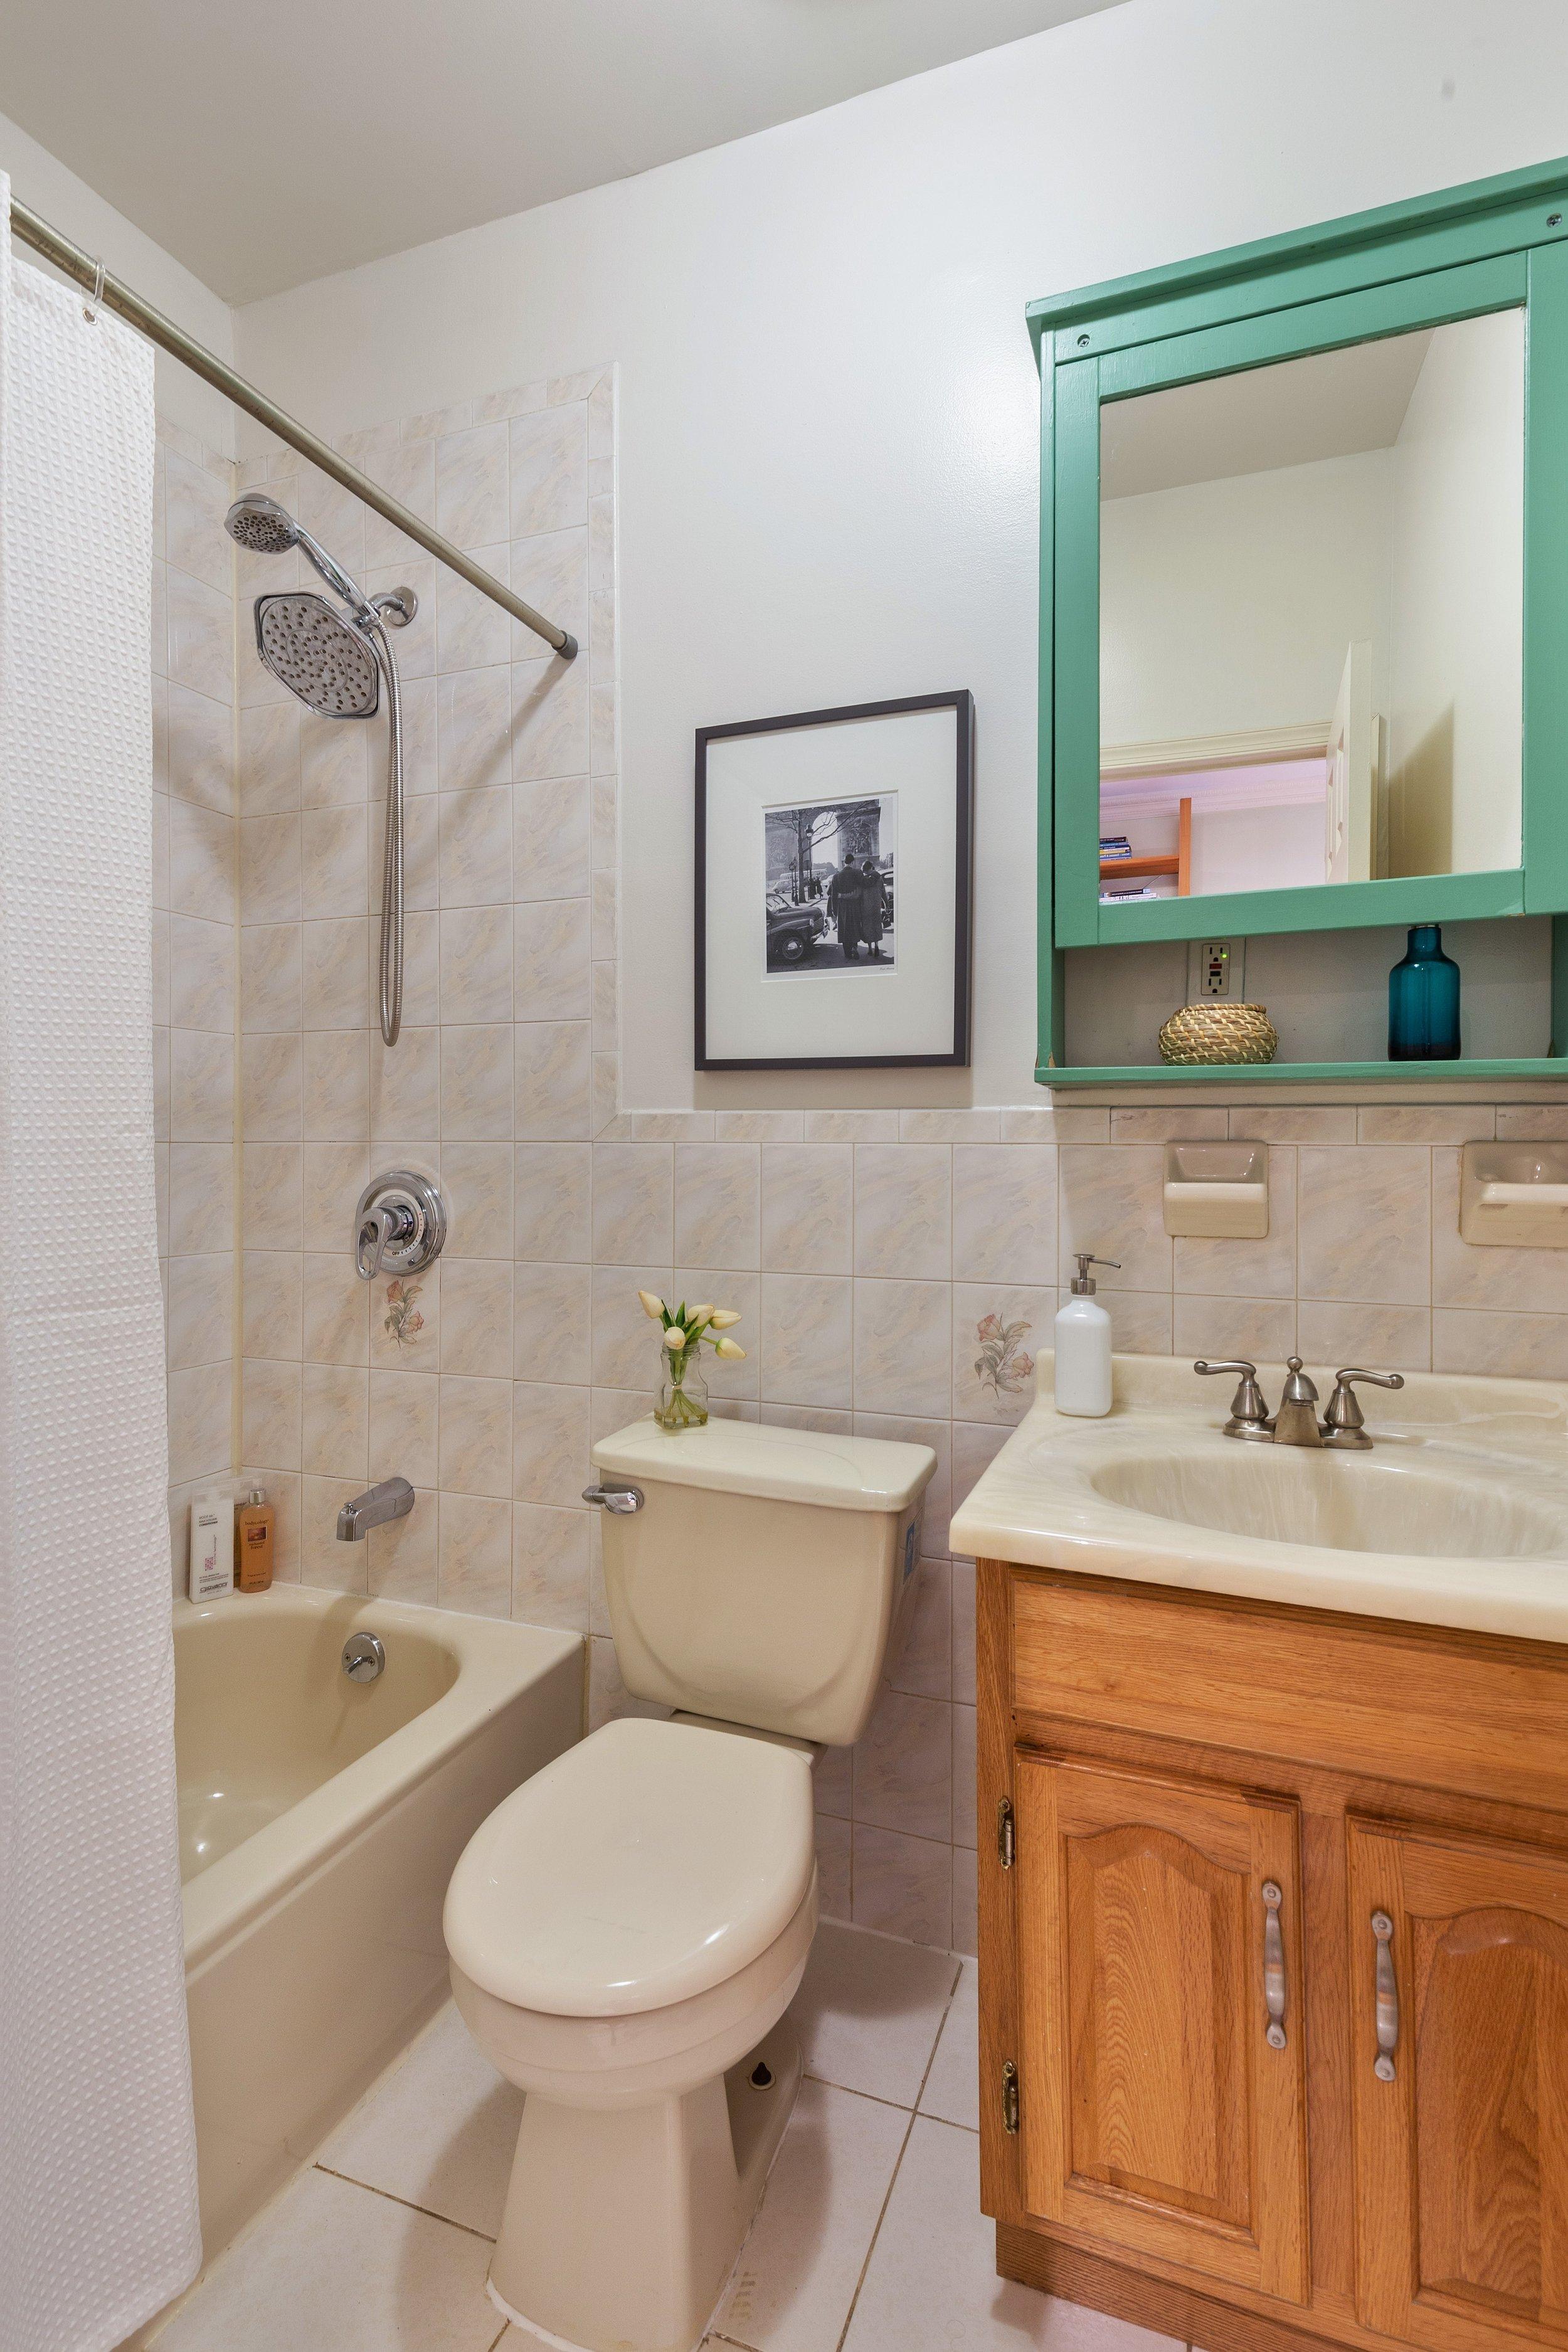 11_474WaverlyAvenue_3_8_Bathroom_HiRes.jpg